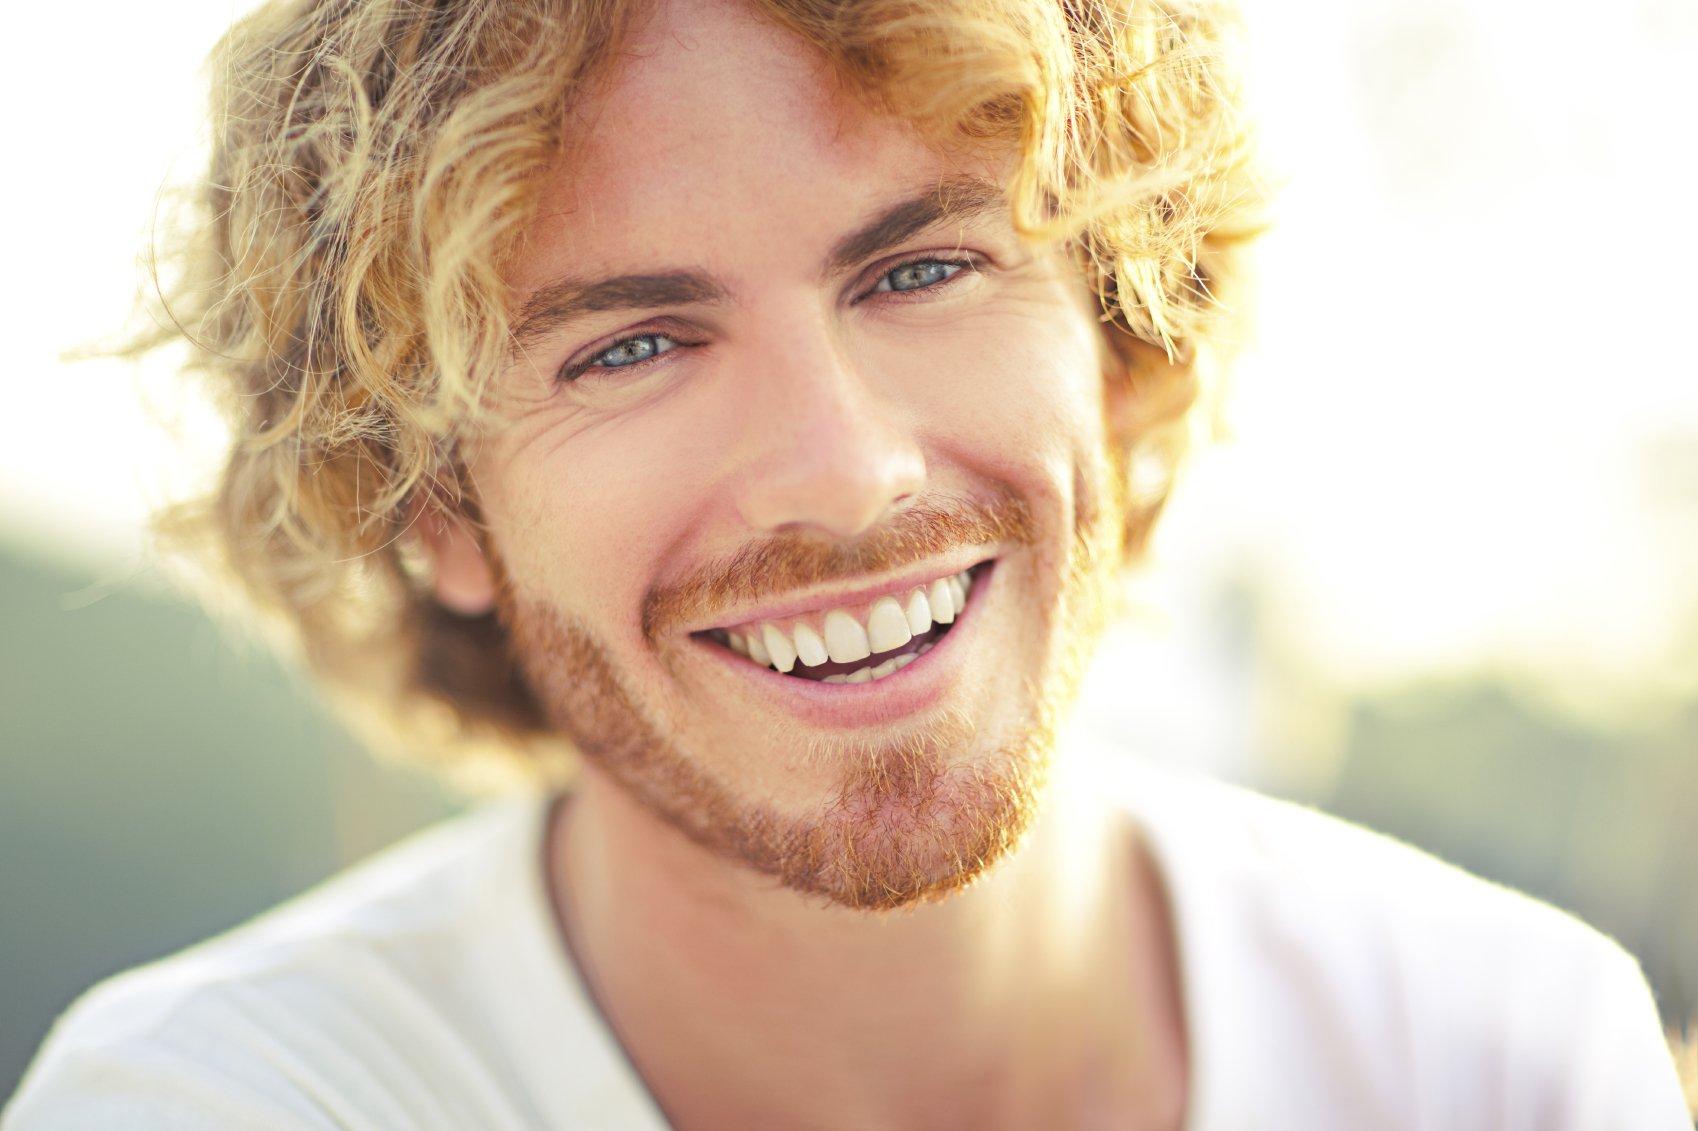 фото улыбающегося мужчины глина